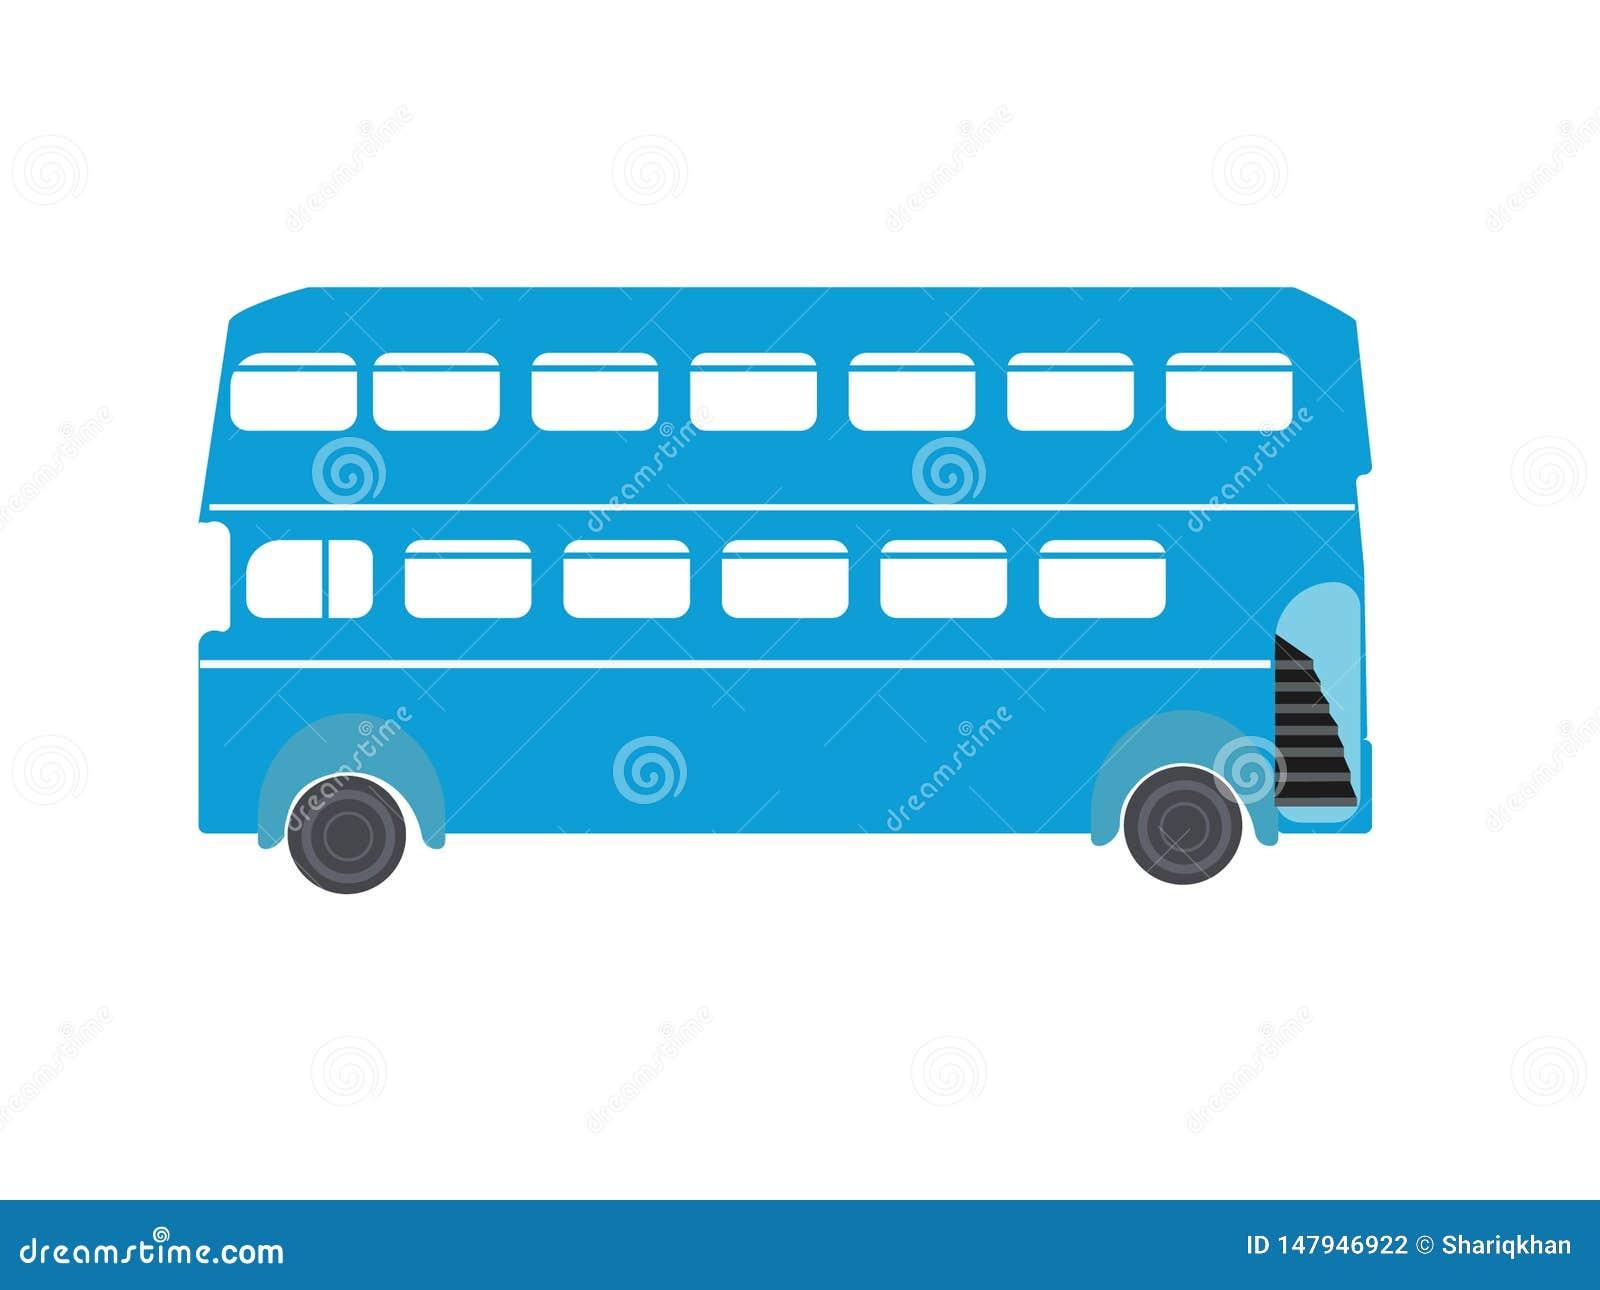 Double Decker Bus Illustration Logo Image Icon EPS file Availabe